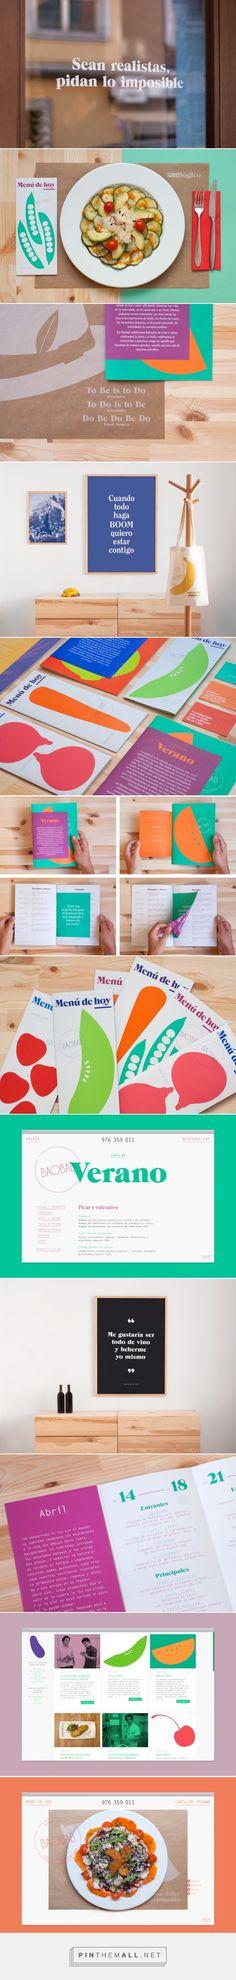 Love the simple shapes and fresh colours: Baobab restaurant branding - Fonts In Use. Brand Identity Design, Branding Design, Logo Design, Business Branding, Logo Branding, Logos, Retro Graphic Design, Web Design, Brand Fonts